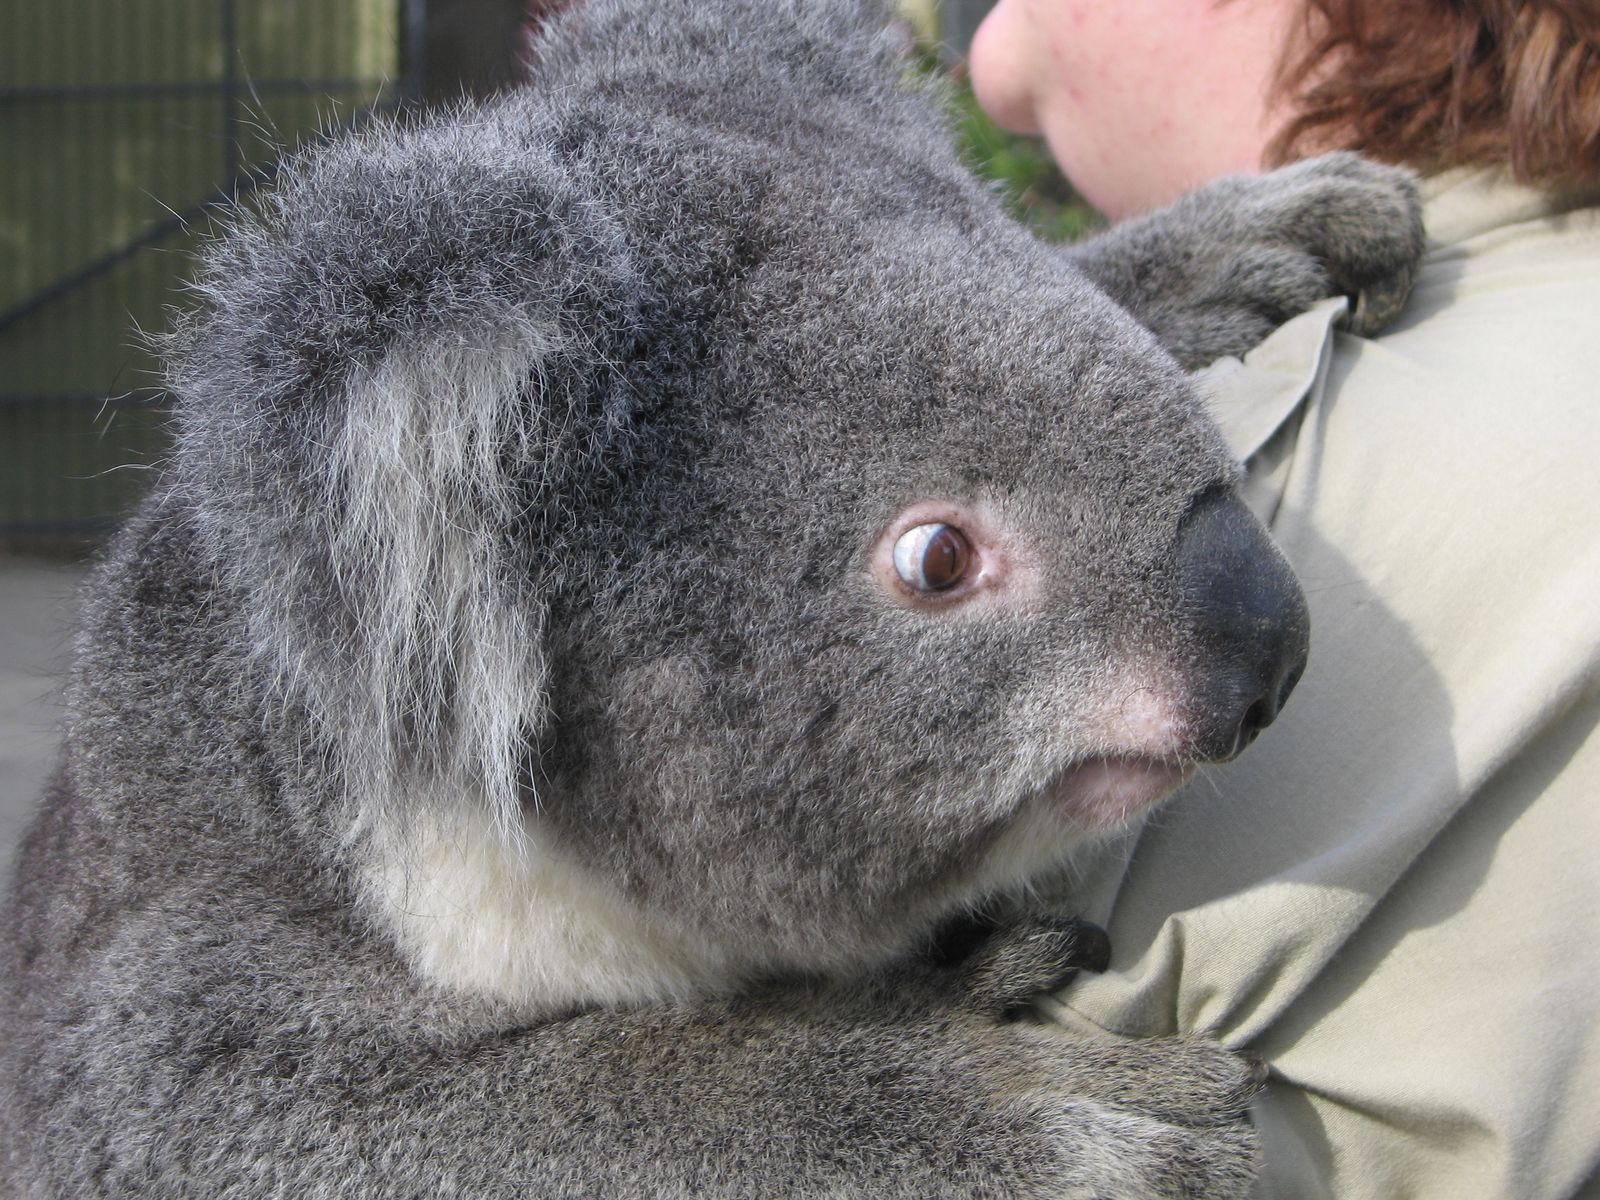 Koala wallpapers fun animals wiki videos pictures stories - Koala components ...